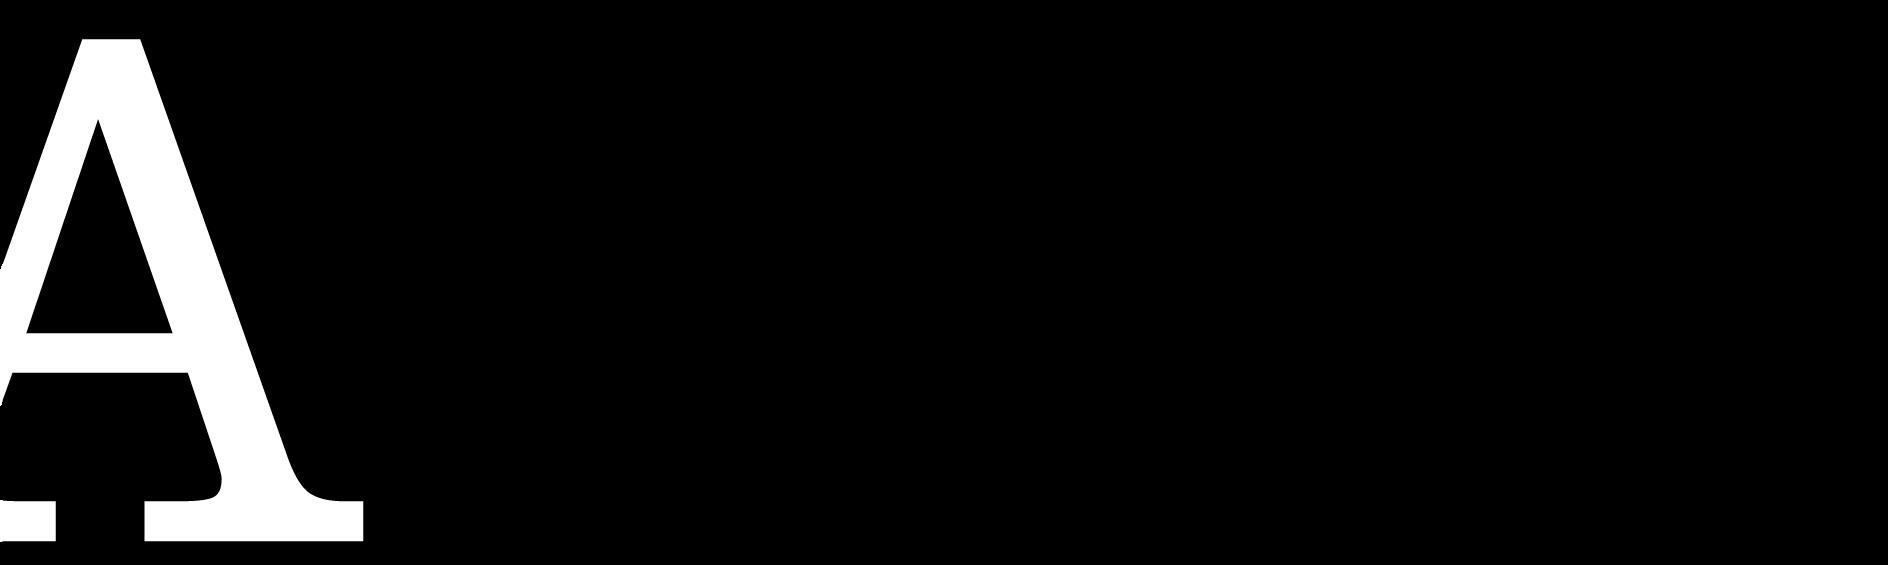 Allenrbook - Full